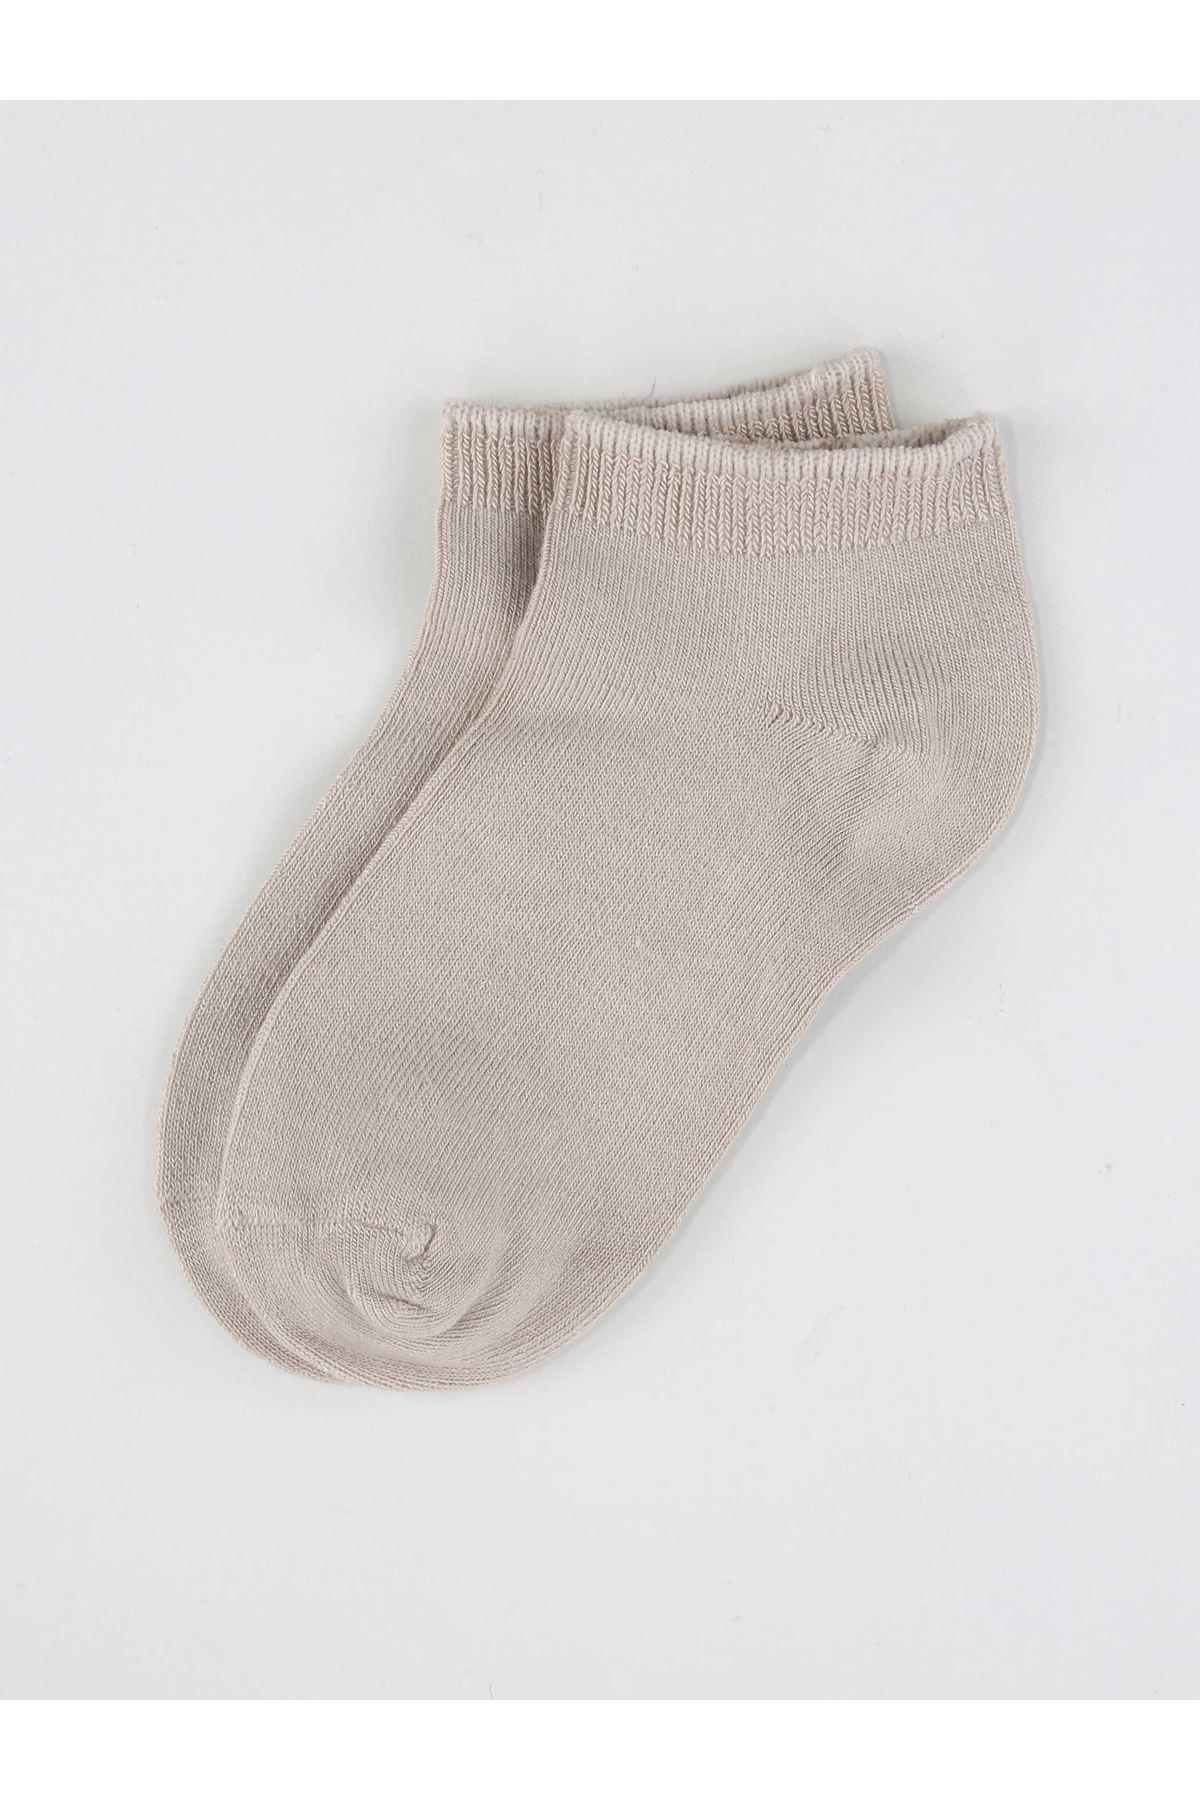 Cream Bamboo Boy's Booties Socks